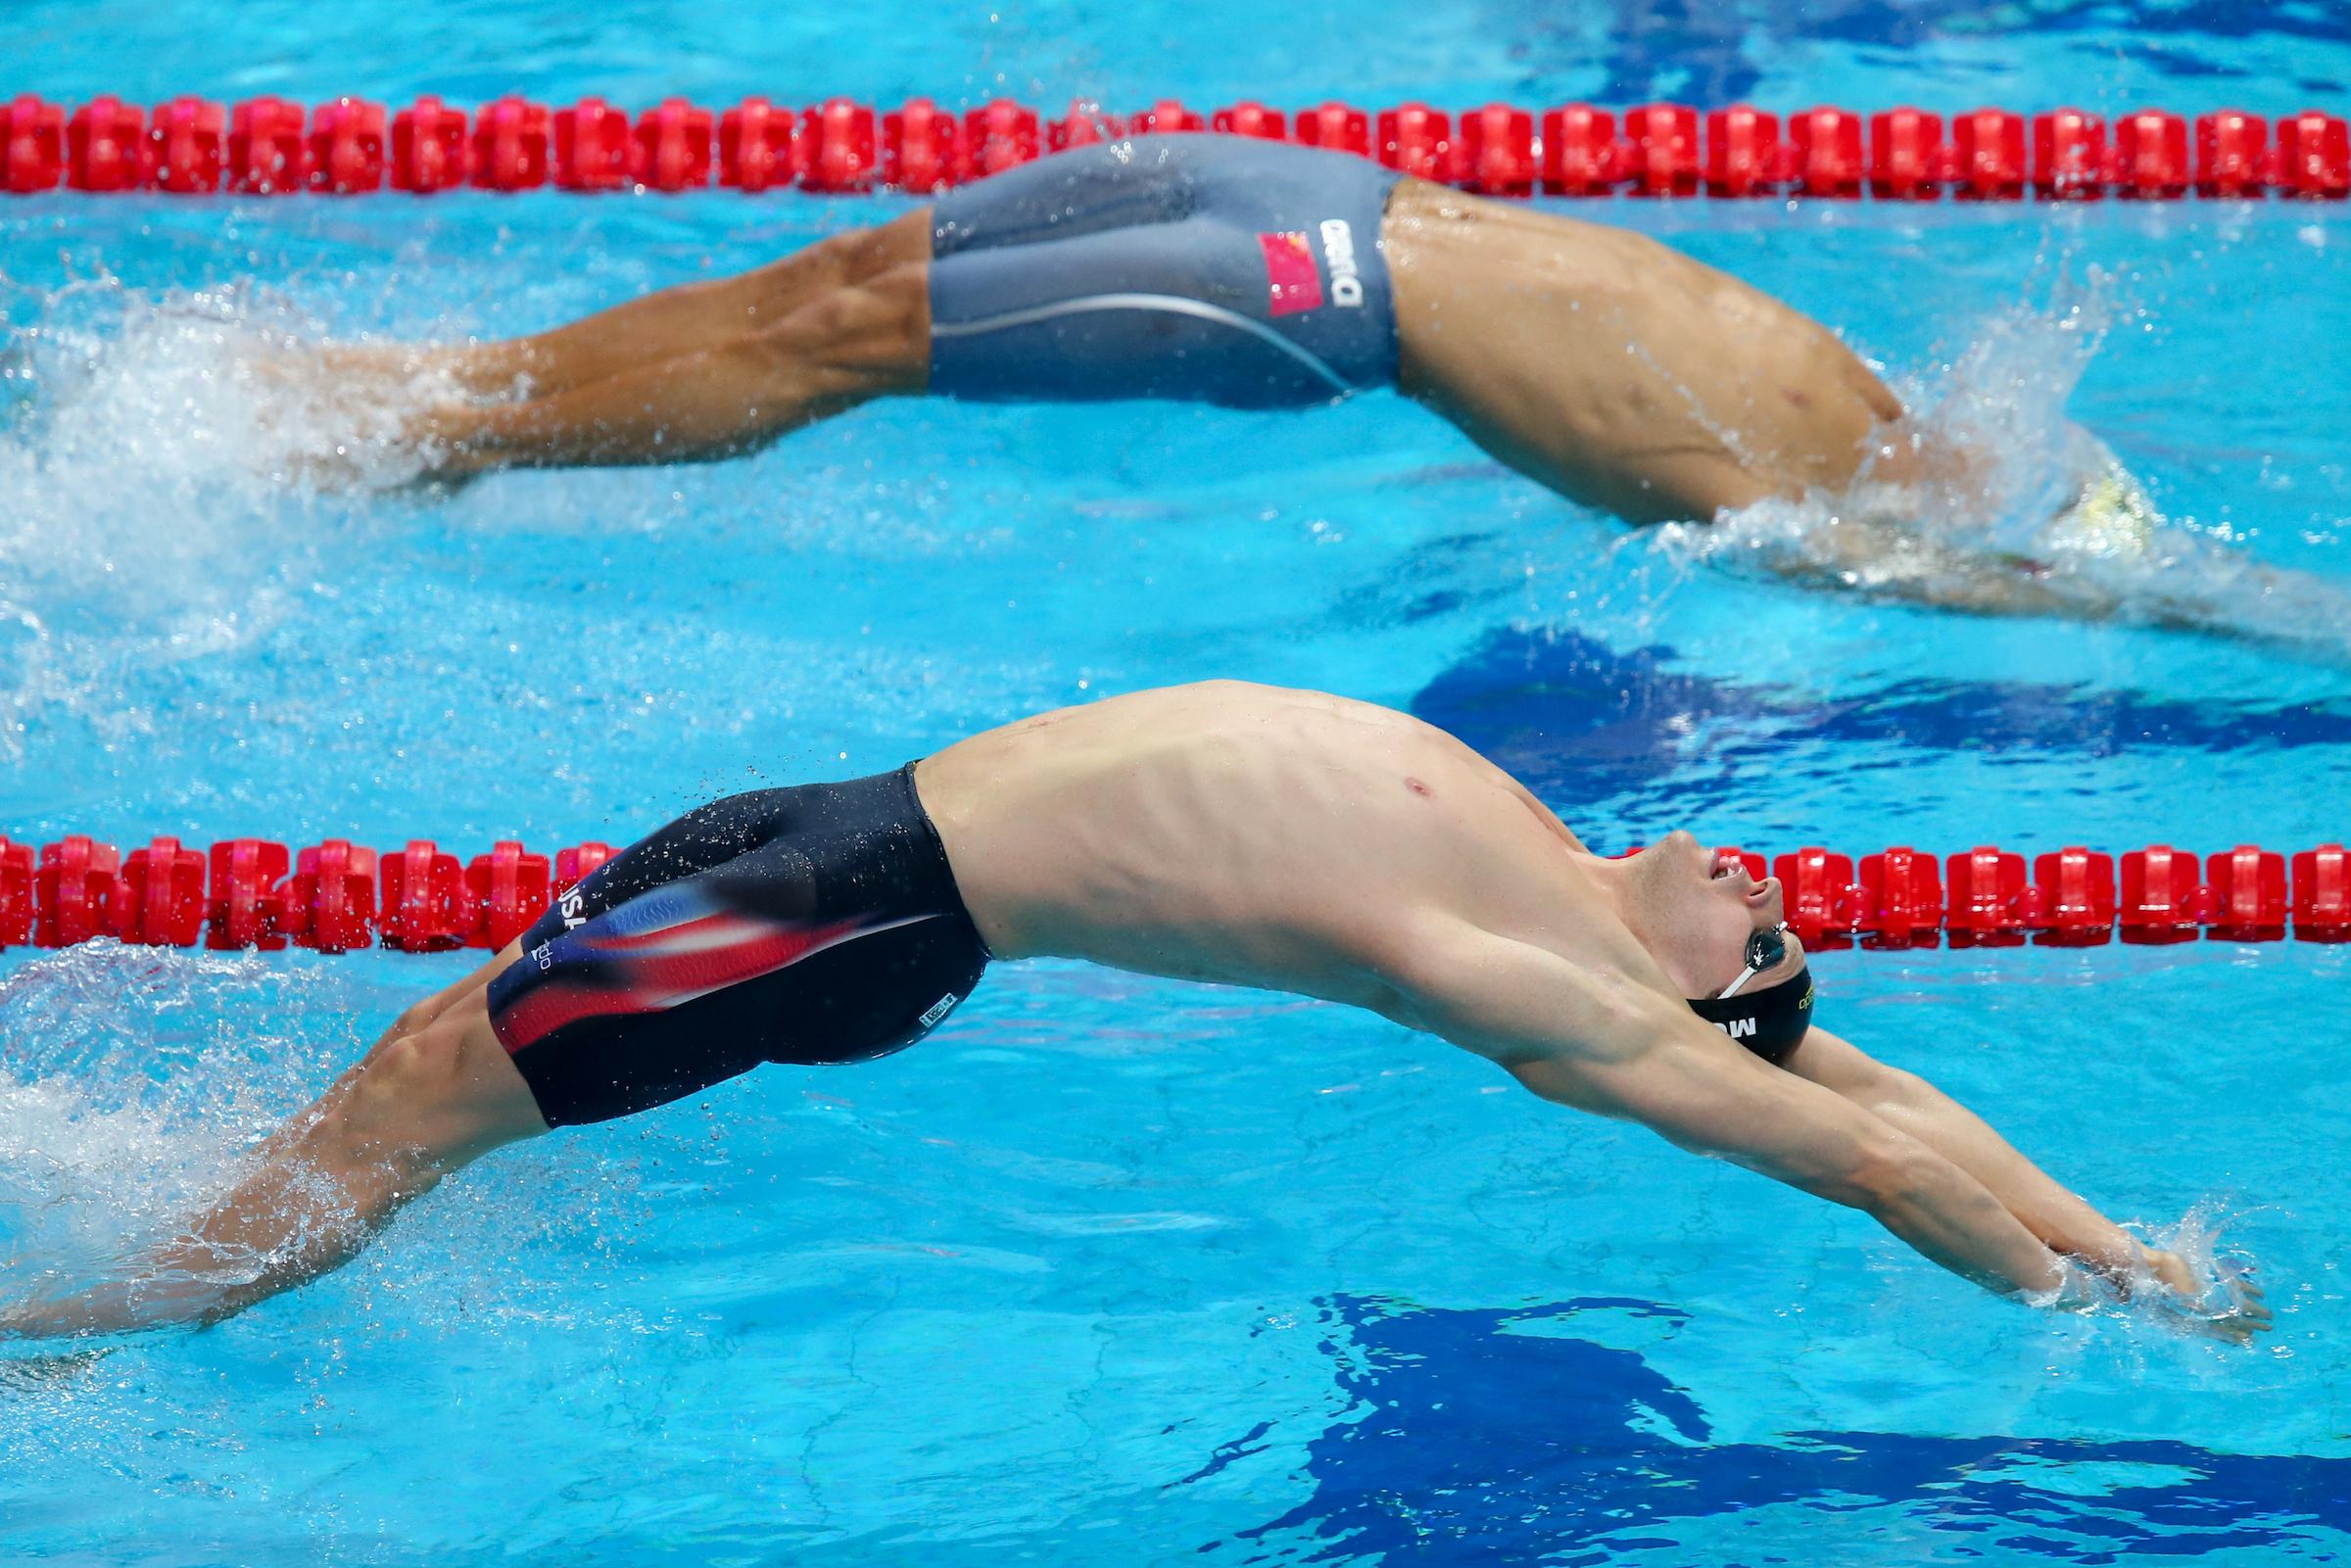 How was the World Aquatics Championship 2017 34